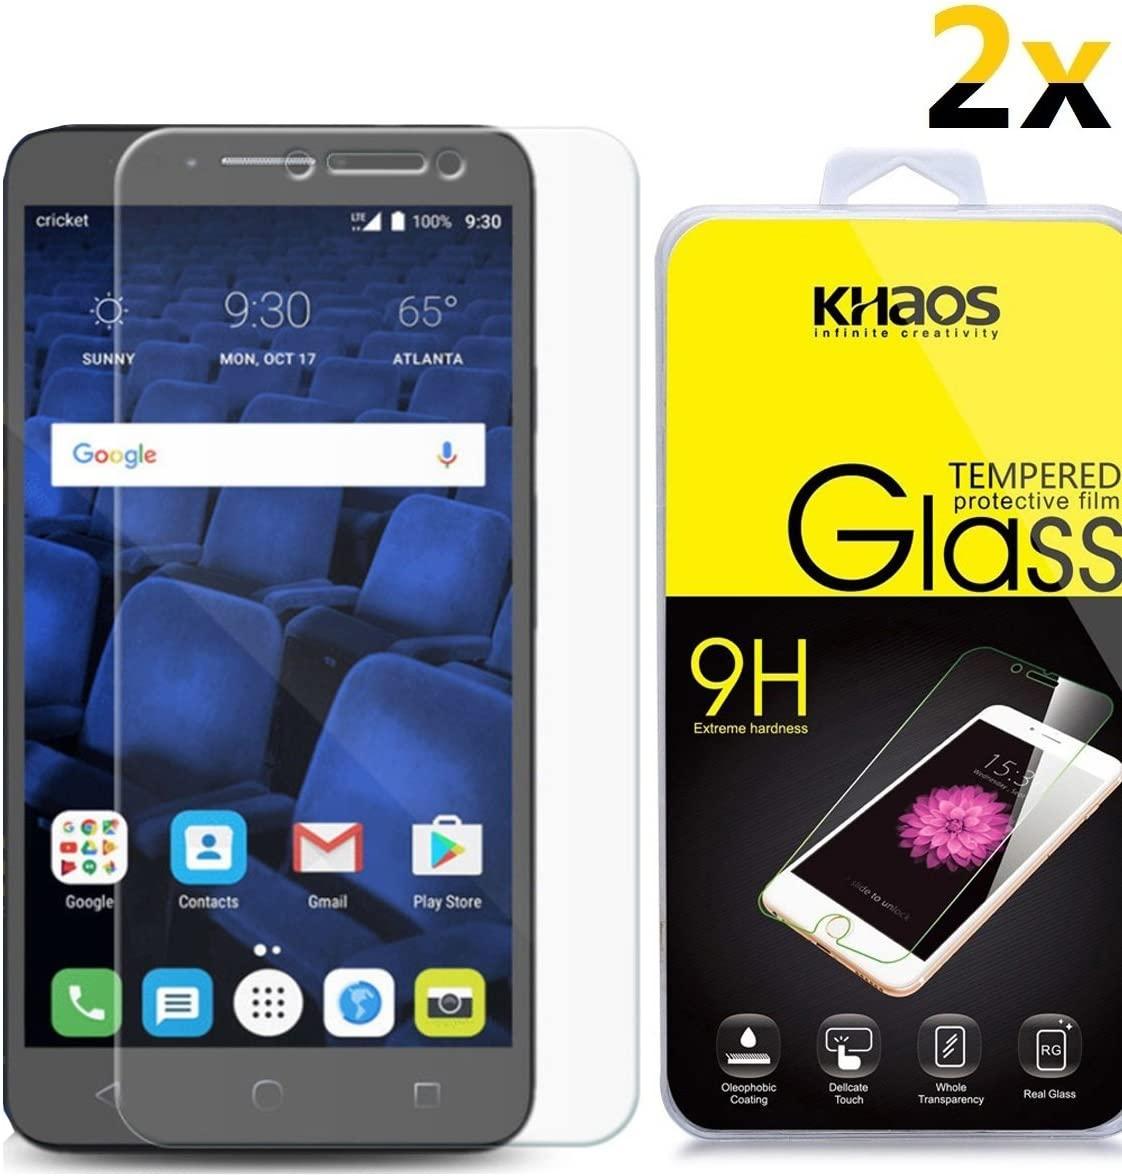 [2-Pack] KHAOS for Alcatel Pixi Theatre 4G LTE Tempered Glass, HD Anti-Scratch, Anti-Fingerprint, Bubble Free